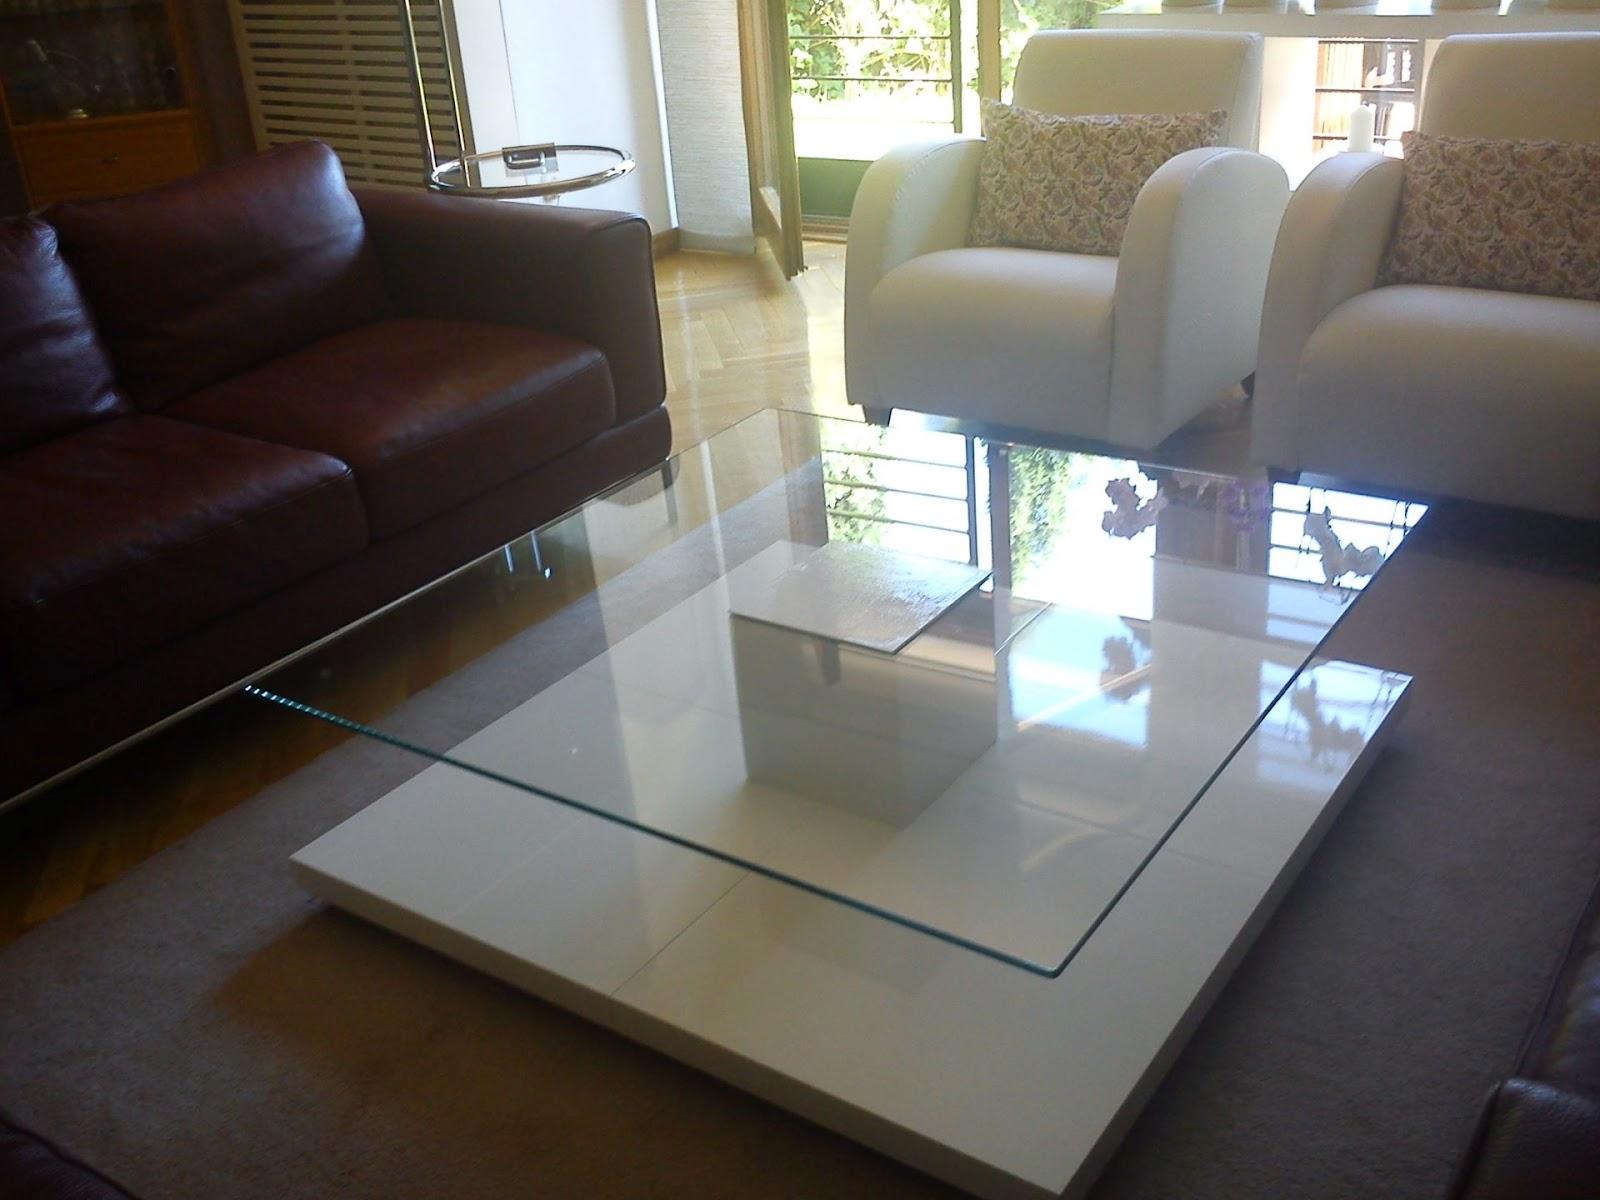 Four lack table base coffee table ikea hackers - Ikea table lack ...